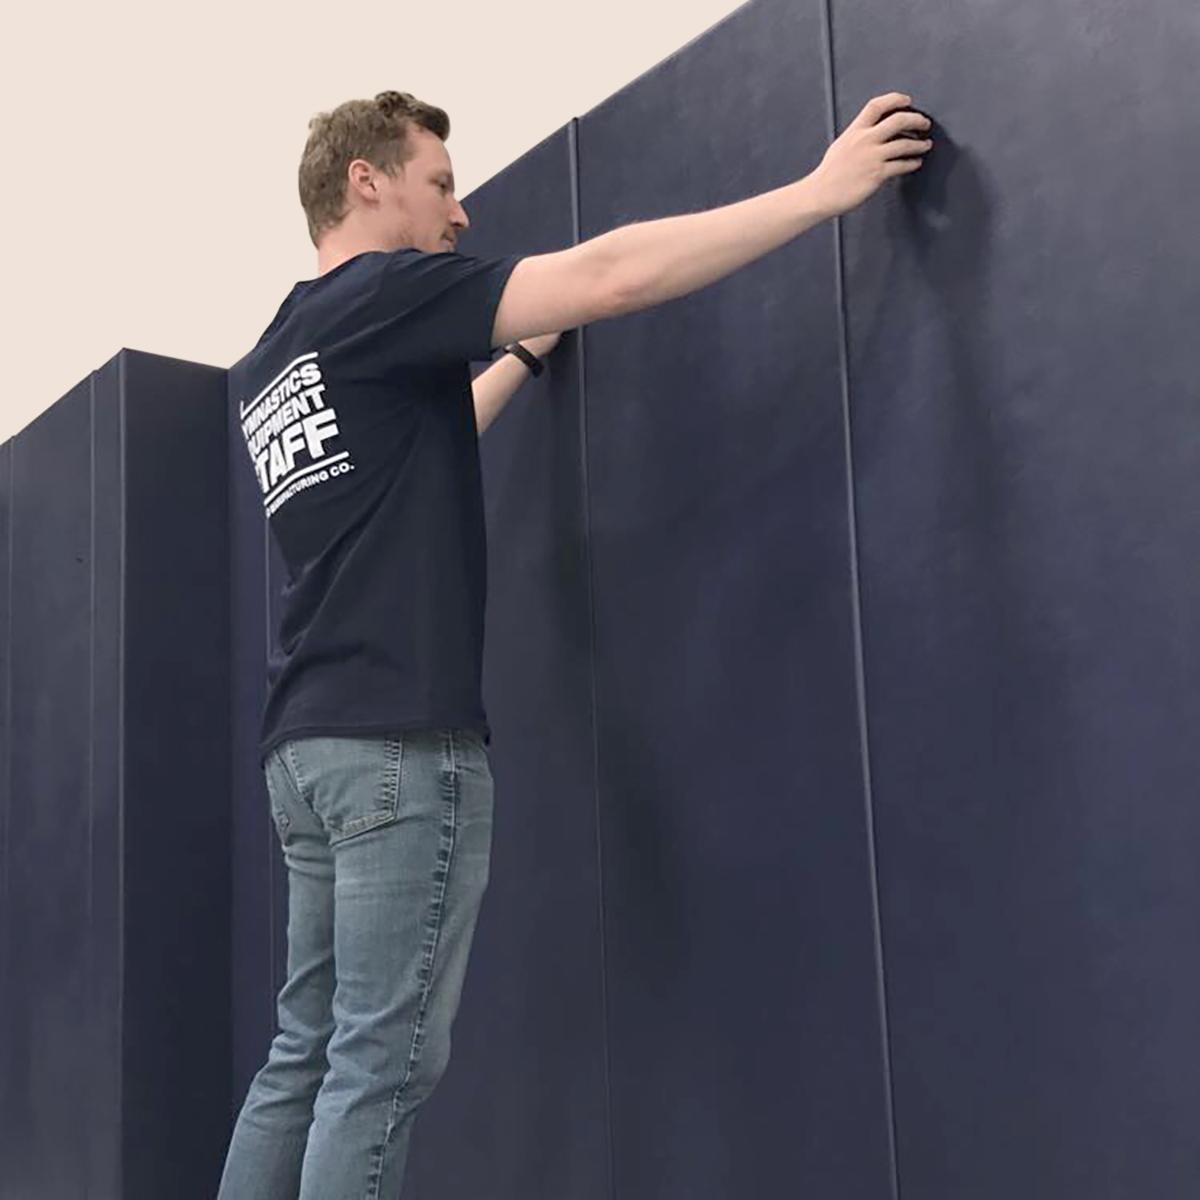 installing wall padding